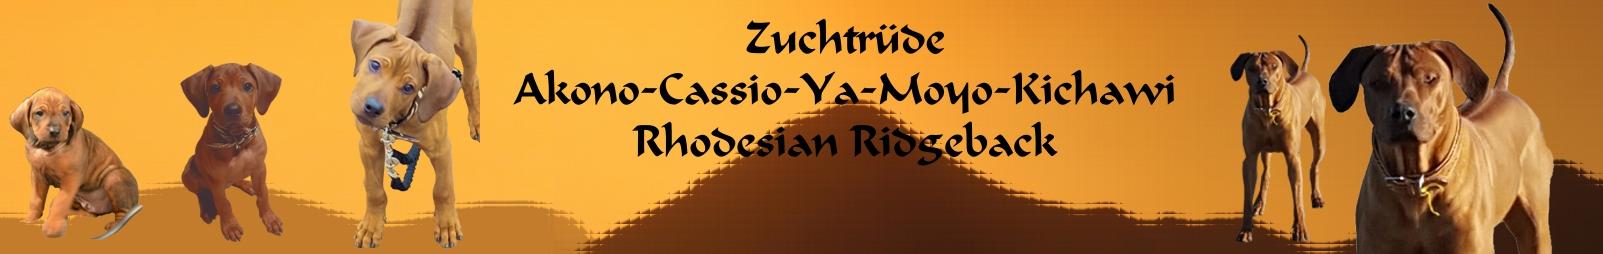 Akono-Cassio-Ya-Moyo-Kichawi